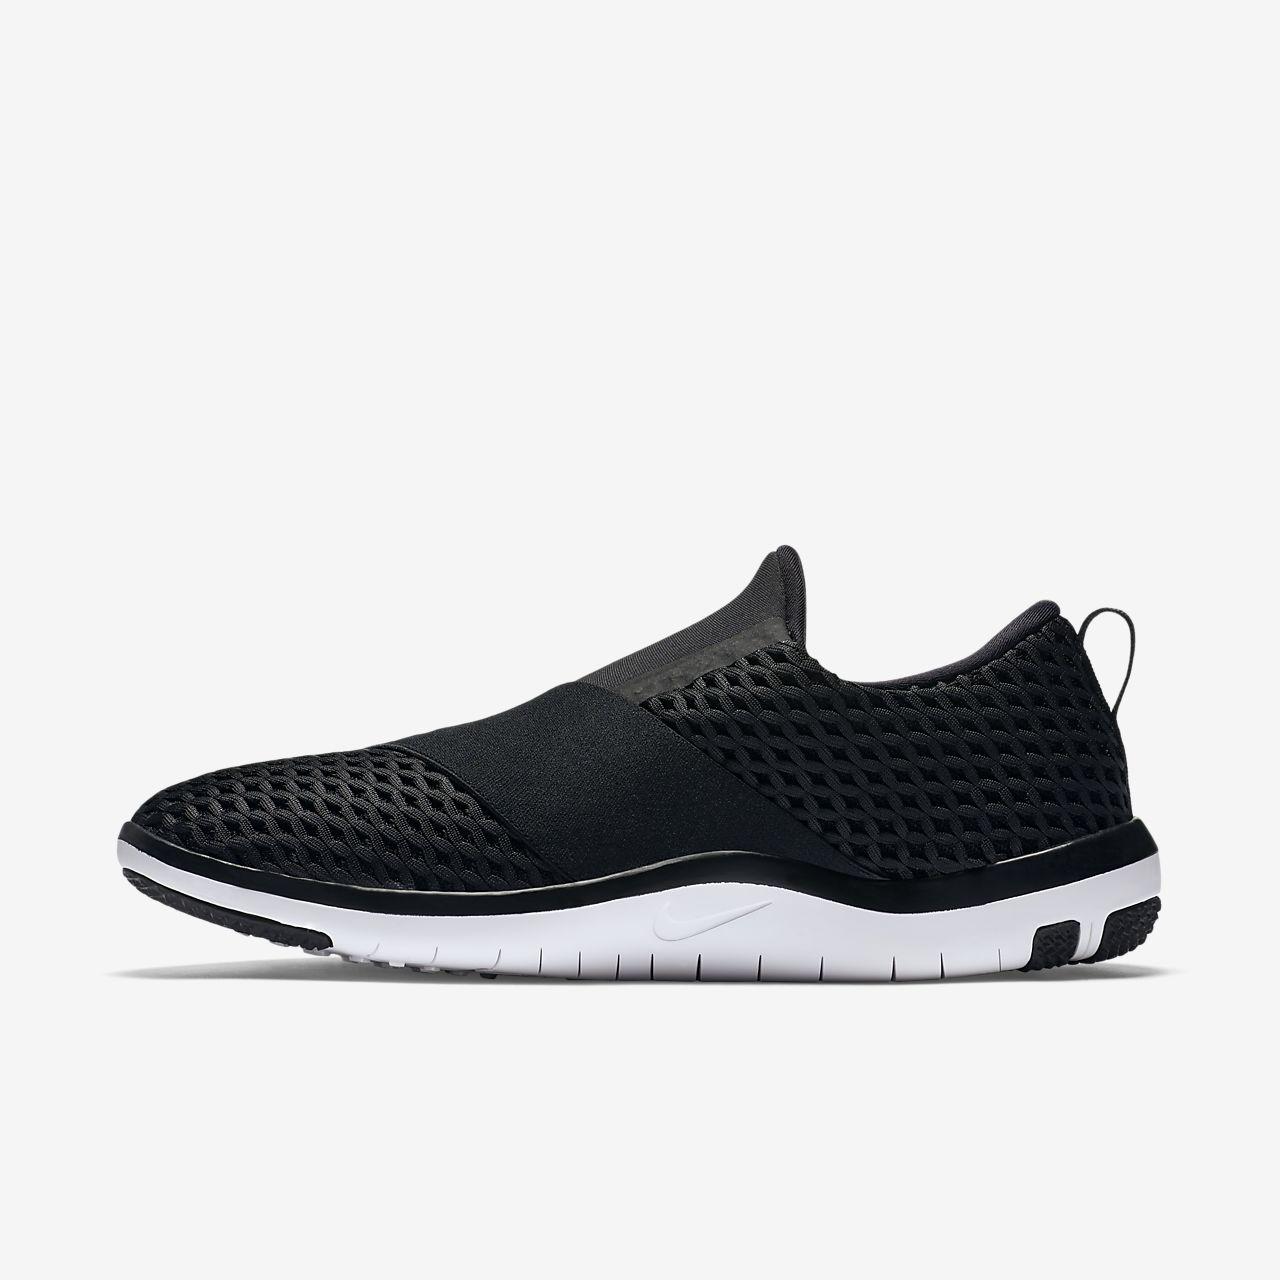 1280x1280 Nike Free Connect Women's Training Shoe. Au